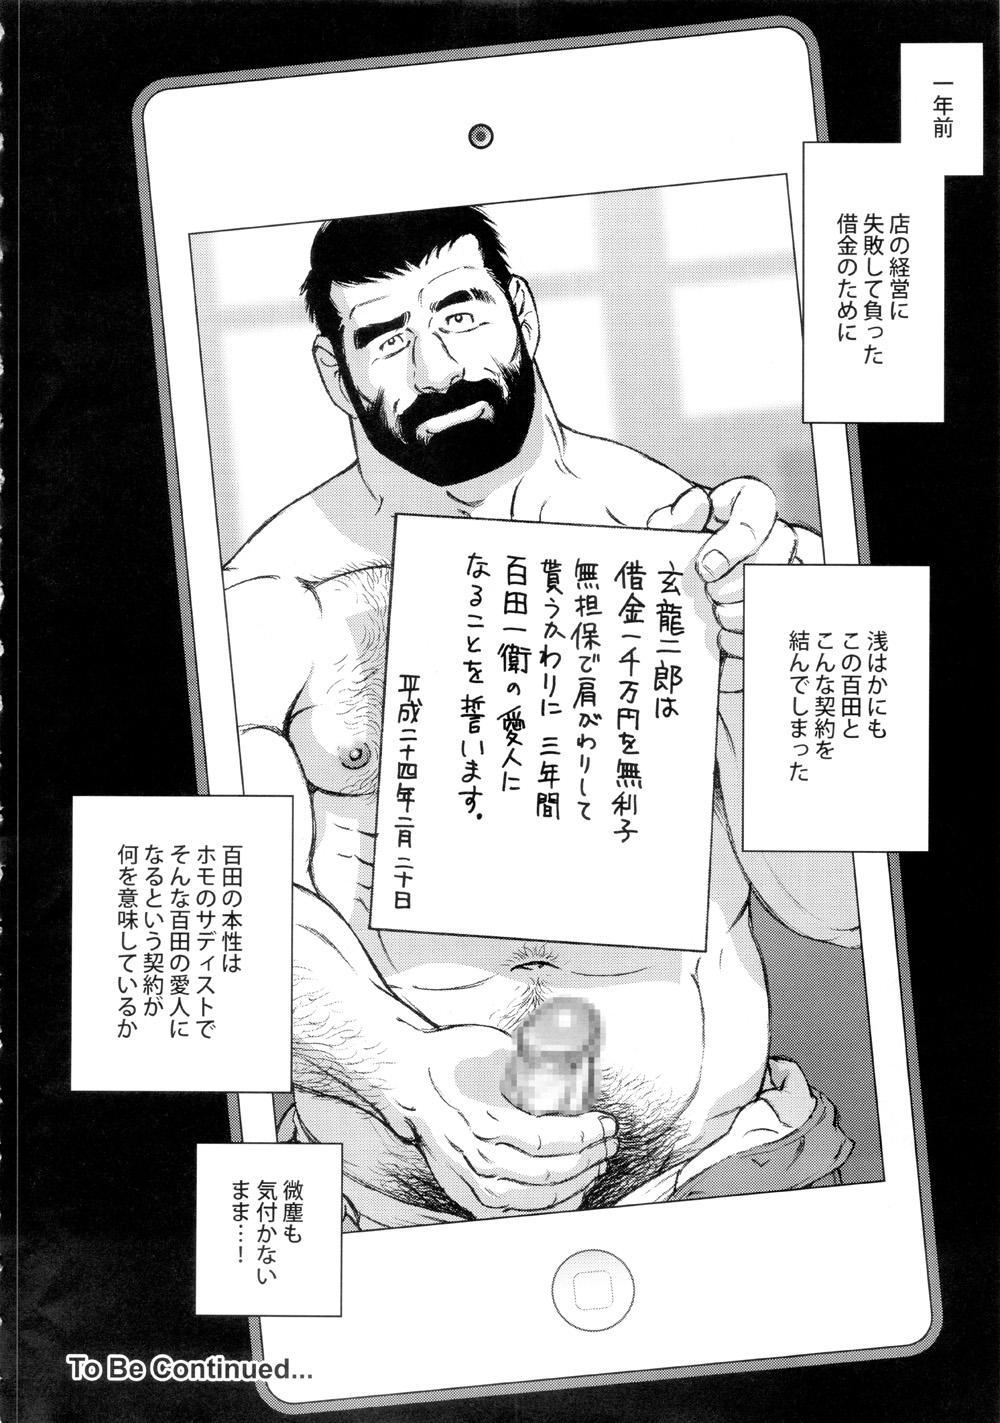 Genryu Chapter 1 15